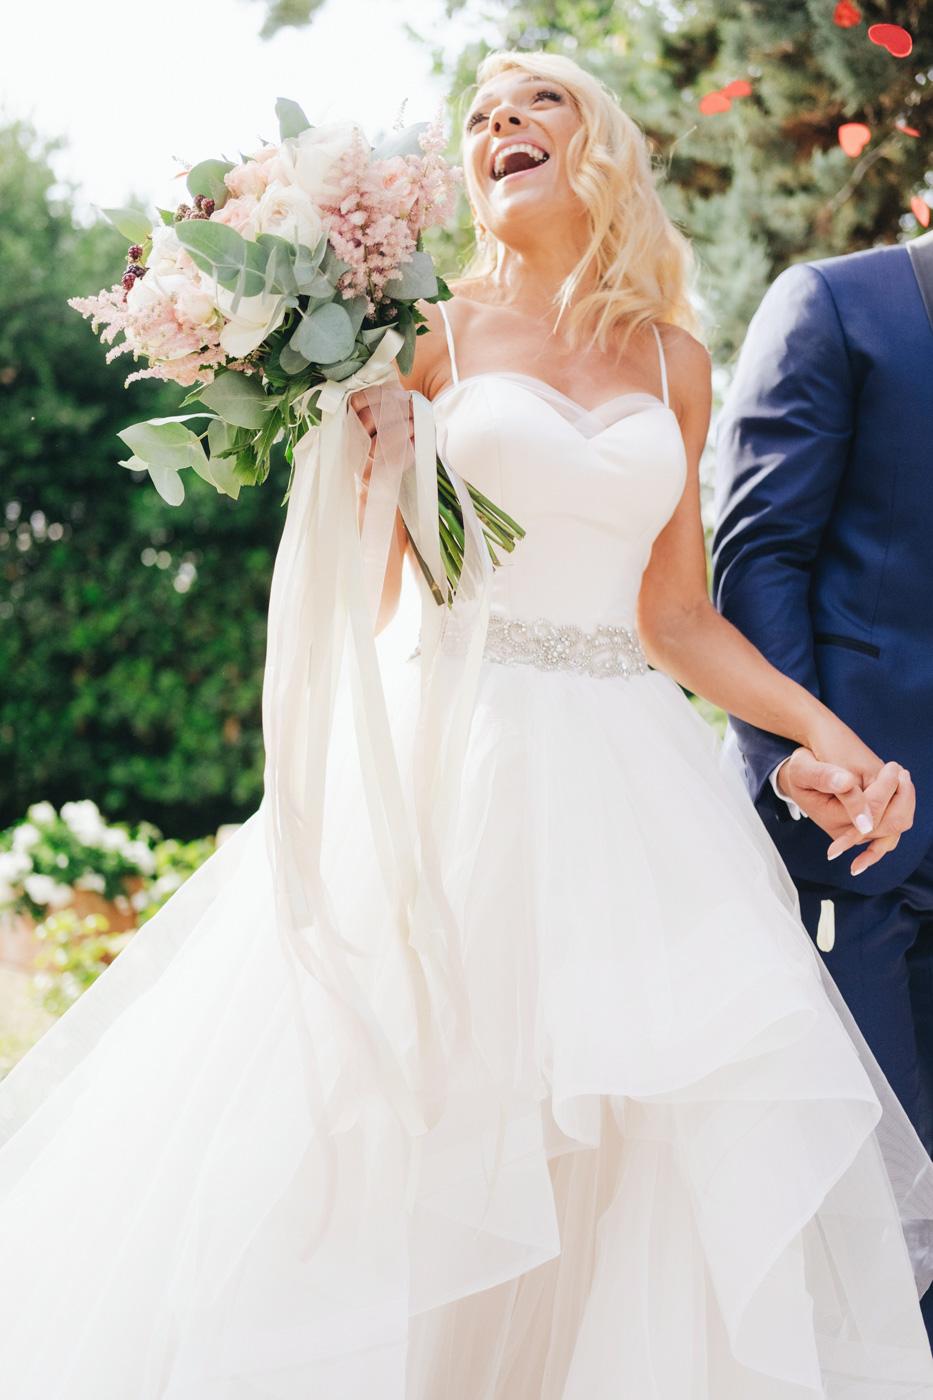 Matrimoni all'italiana wedding photographer italy-89.jpg